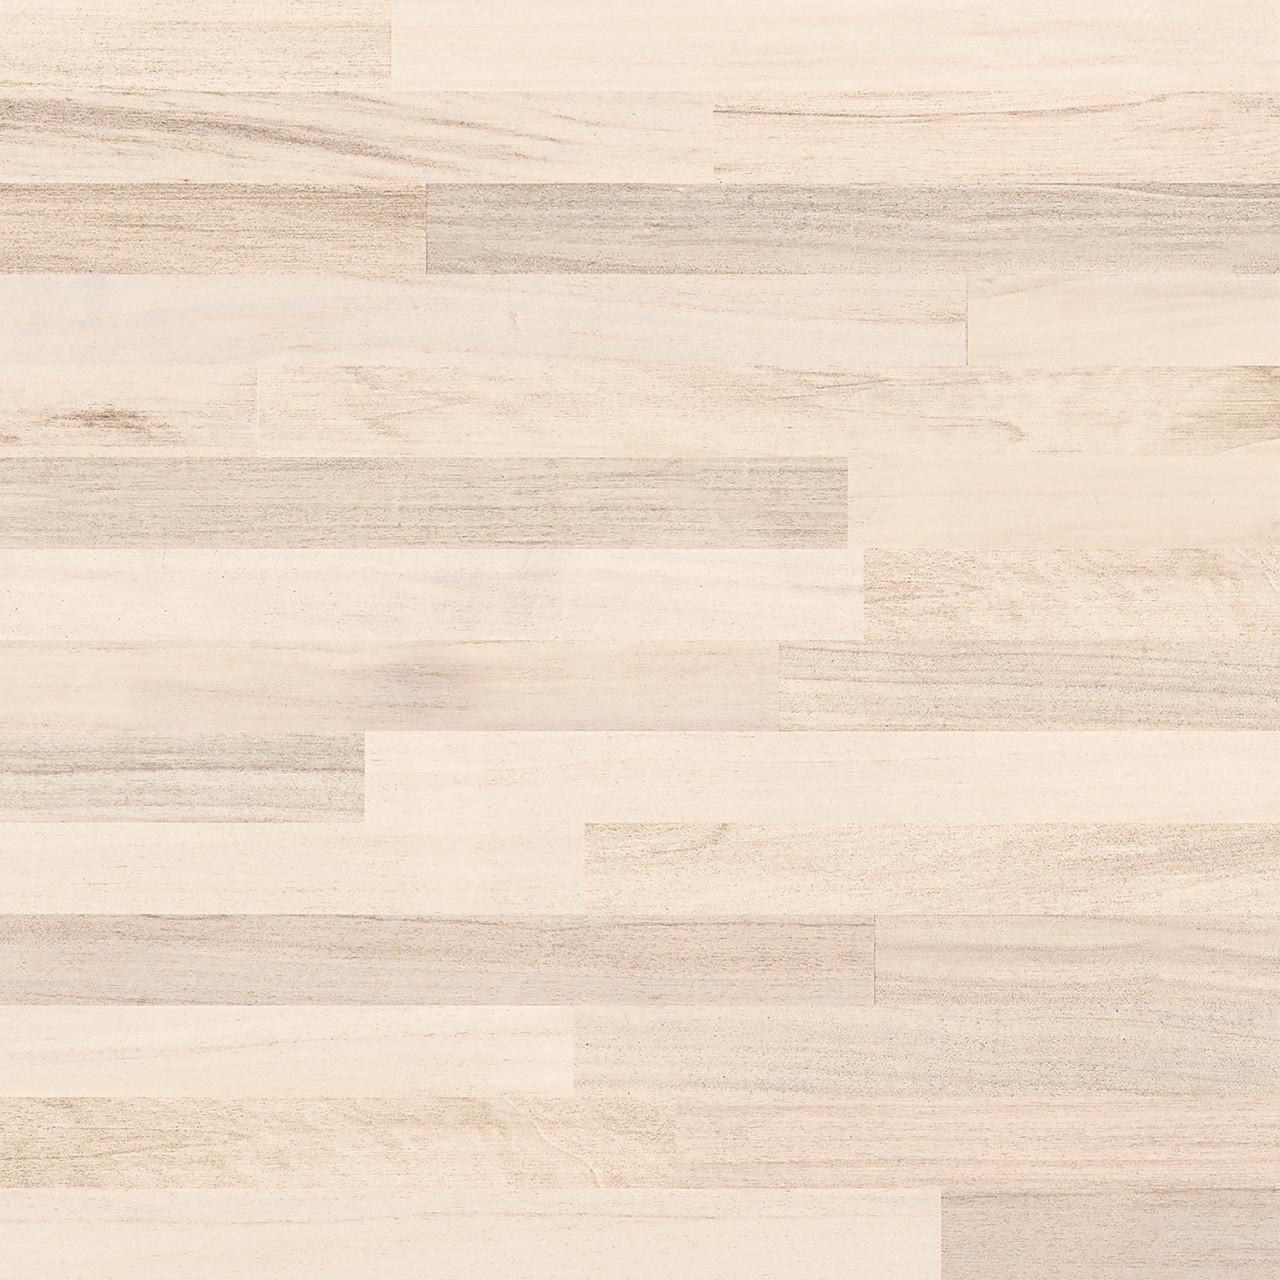 Active home centre tabula hd 20 x 20 ceramic floor tile 11pis image 1 dailygadgetfo Gallery